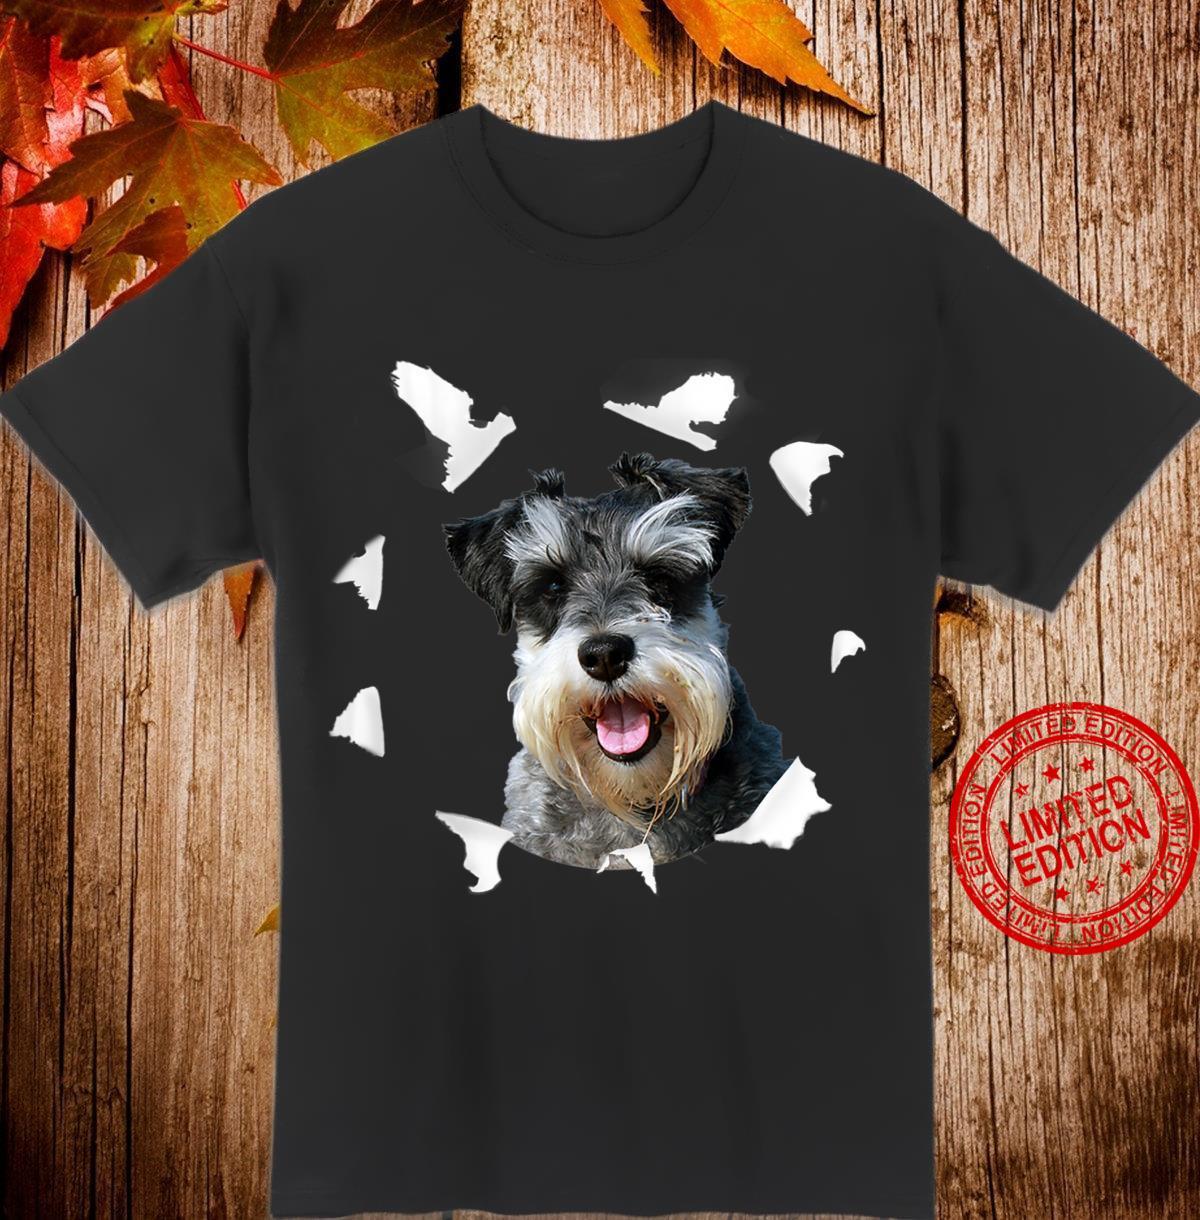 Zwergschnauzer Shirt Zwergschnauzer Hund Shirt